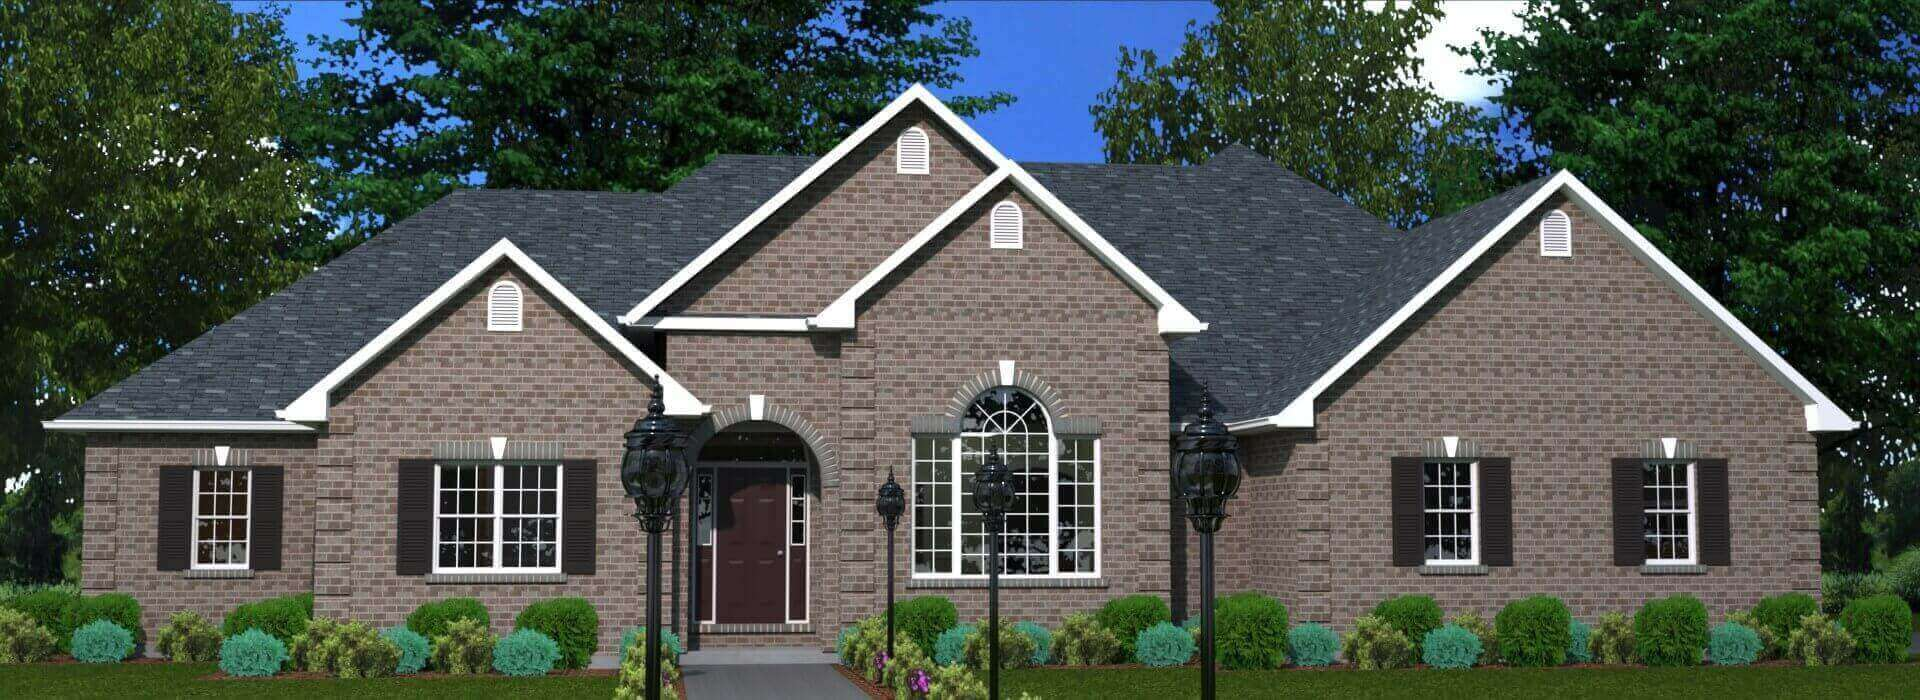 2331 exterior house